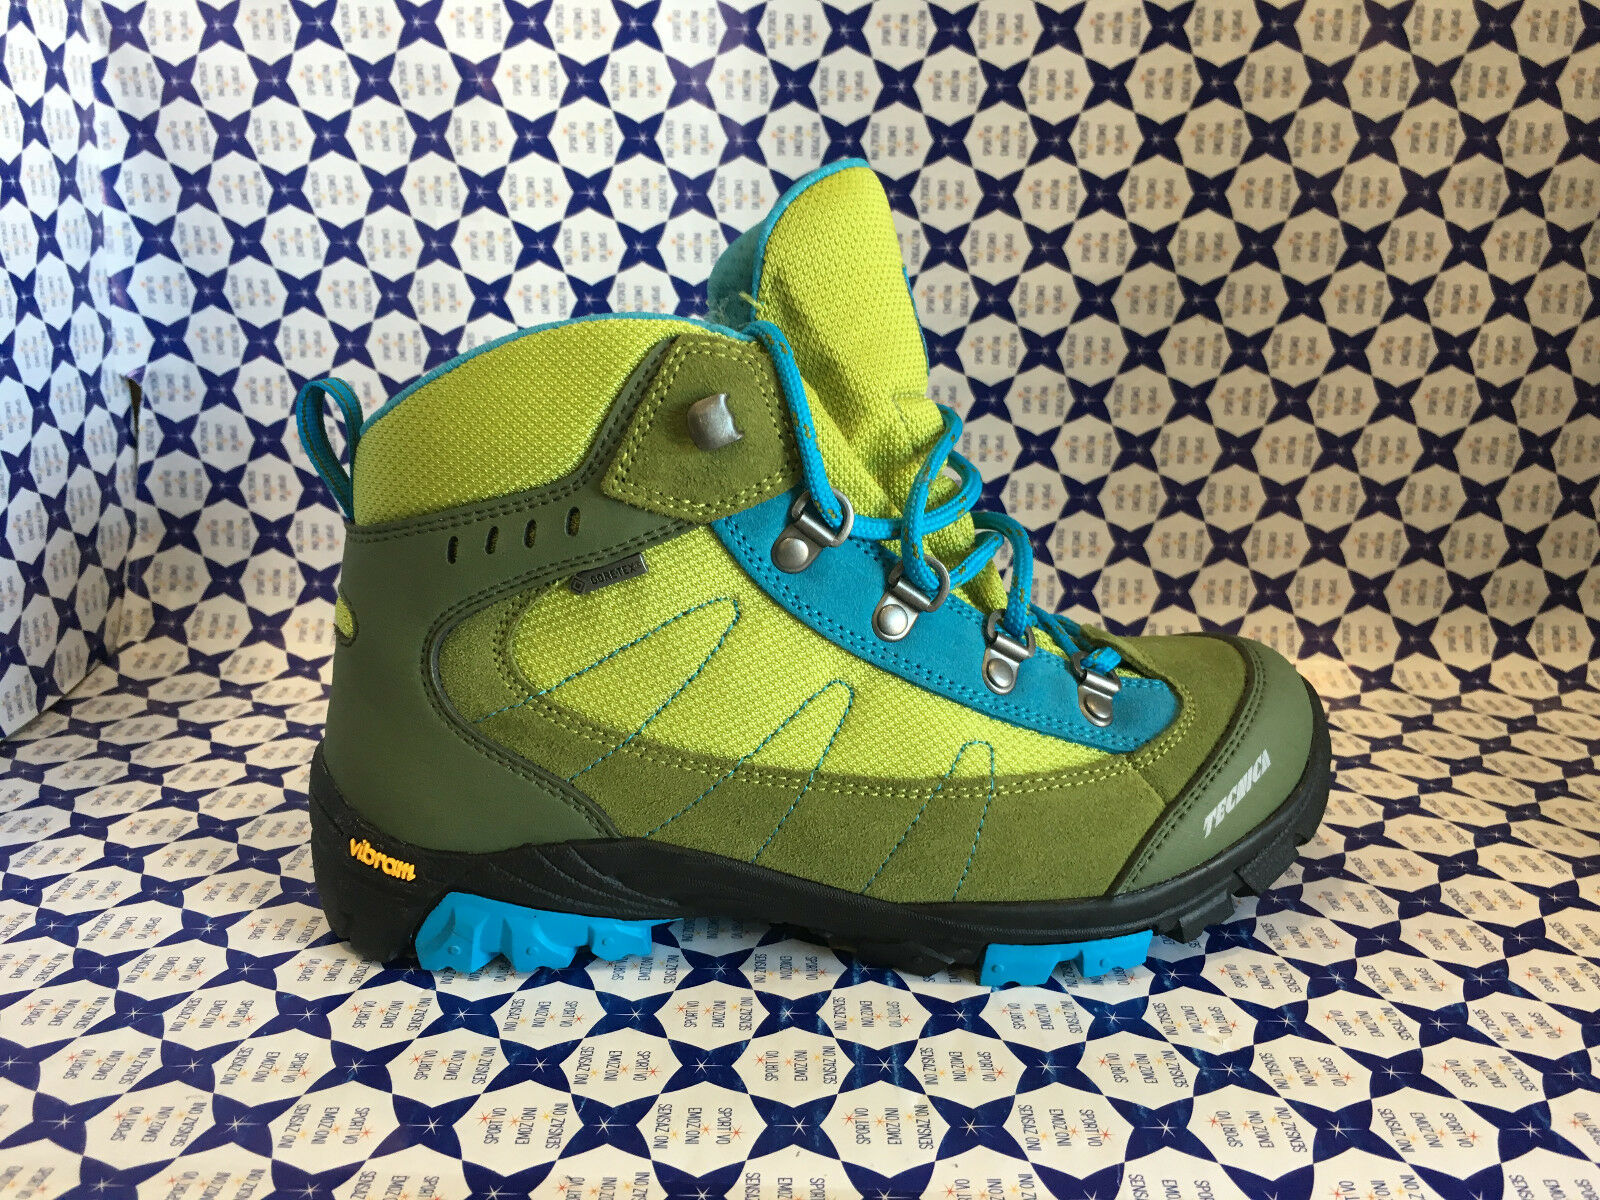 zapatos Trekking Tecnica Tecnica Tecnica Junior Unisex - Makalu GTX - Verde Azzurro - 311075 1cfb0c